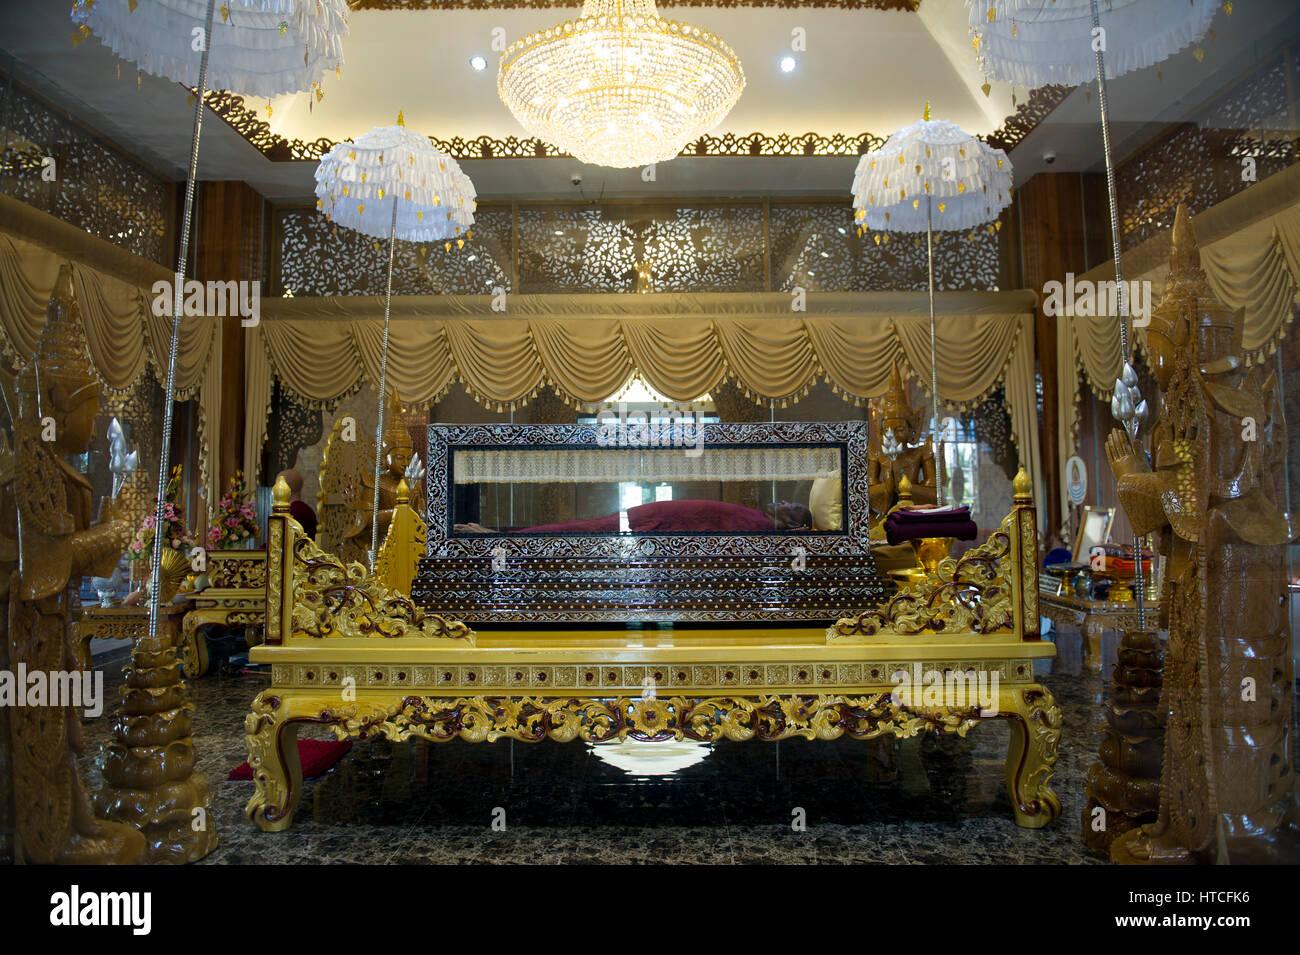 Myanmar (formerly Burma). Mon State. Yadana Daung Mawlamyine (Moulmein) surroundings, Win Sein Taw Ya. Mausoleum - Stock Image